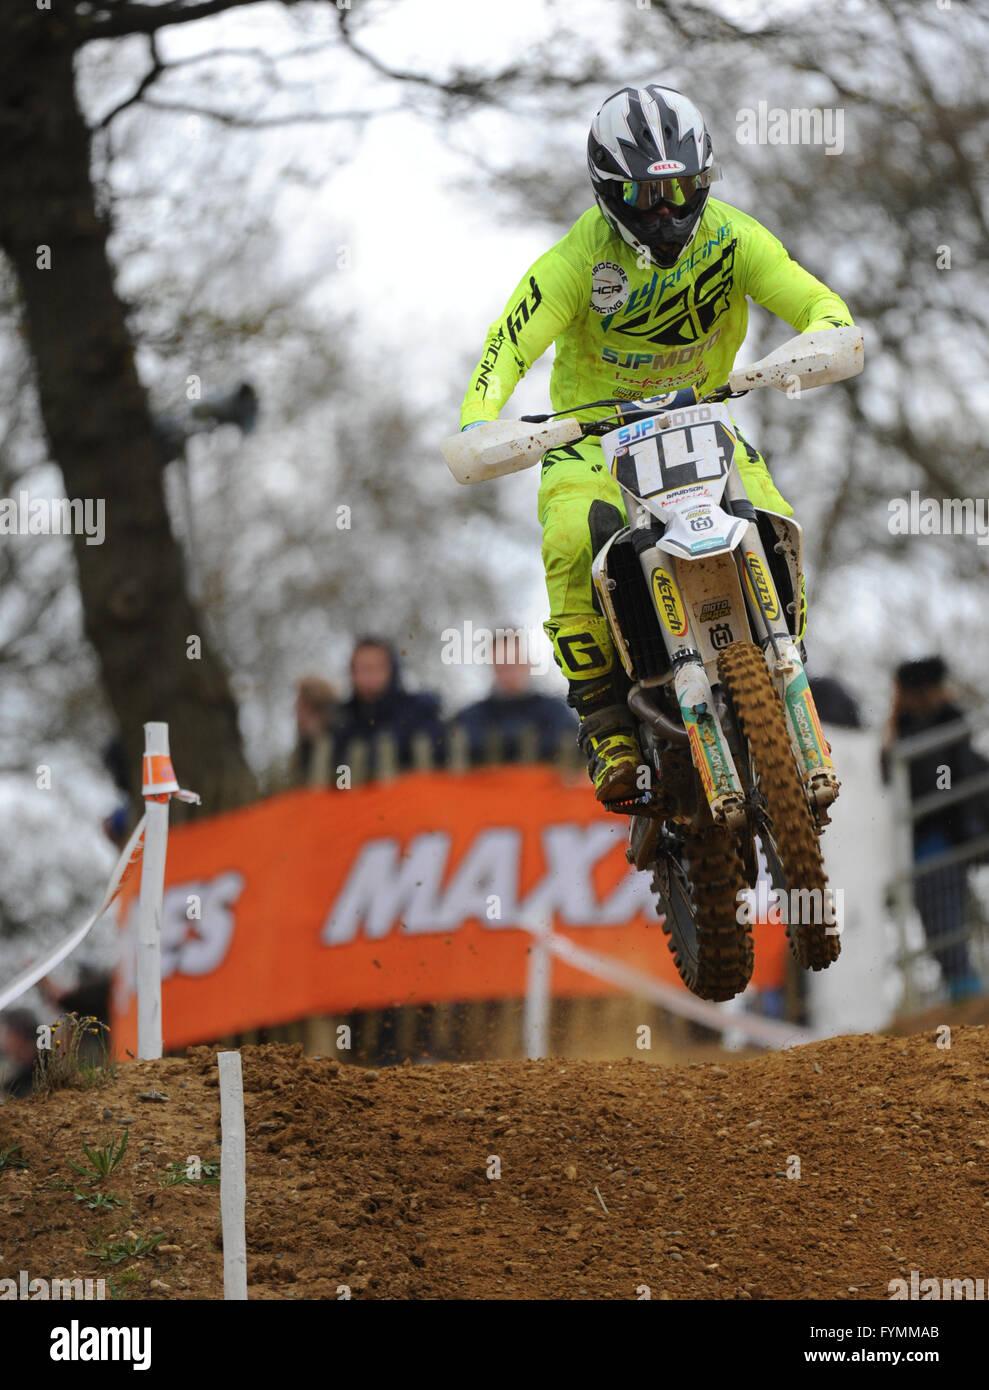 24.04.16 Maxxis British MX Championships. Round 2. Canada Heights, Kent. Robert Davidson(14) riding the SJP Moto - Stock Image